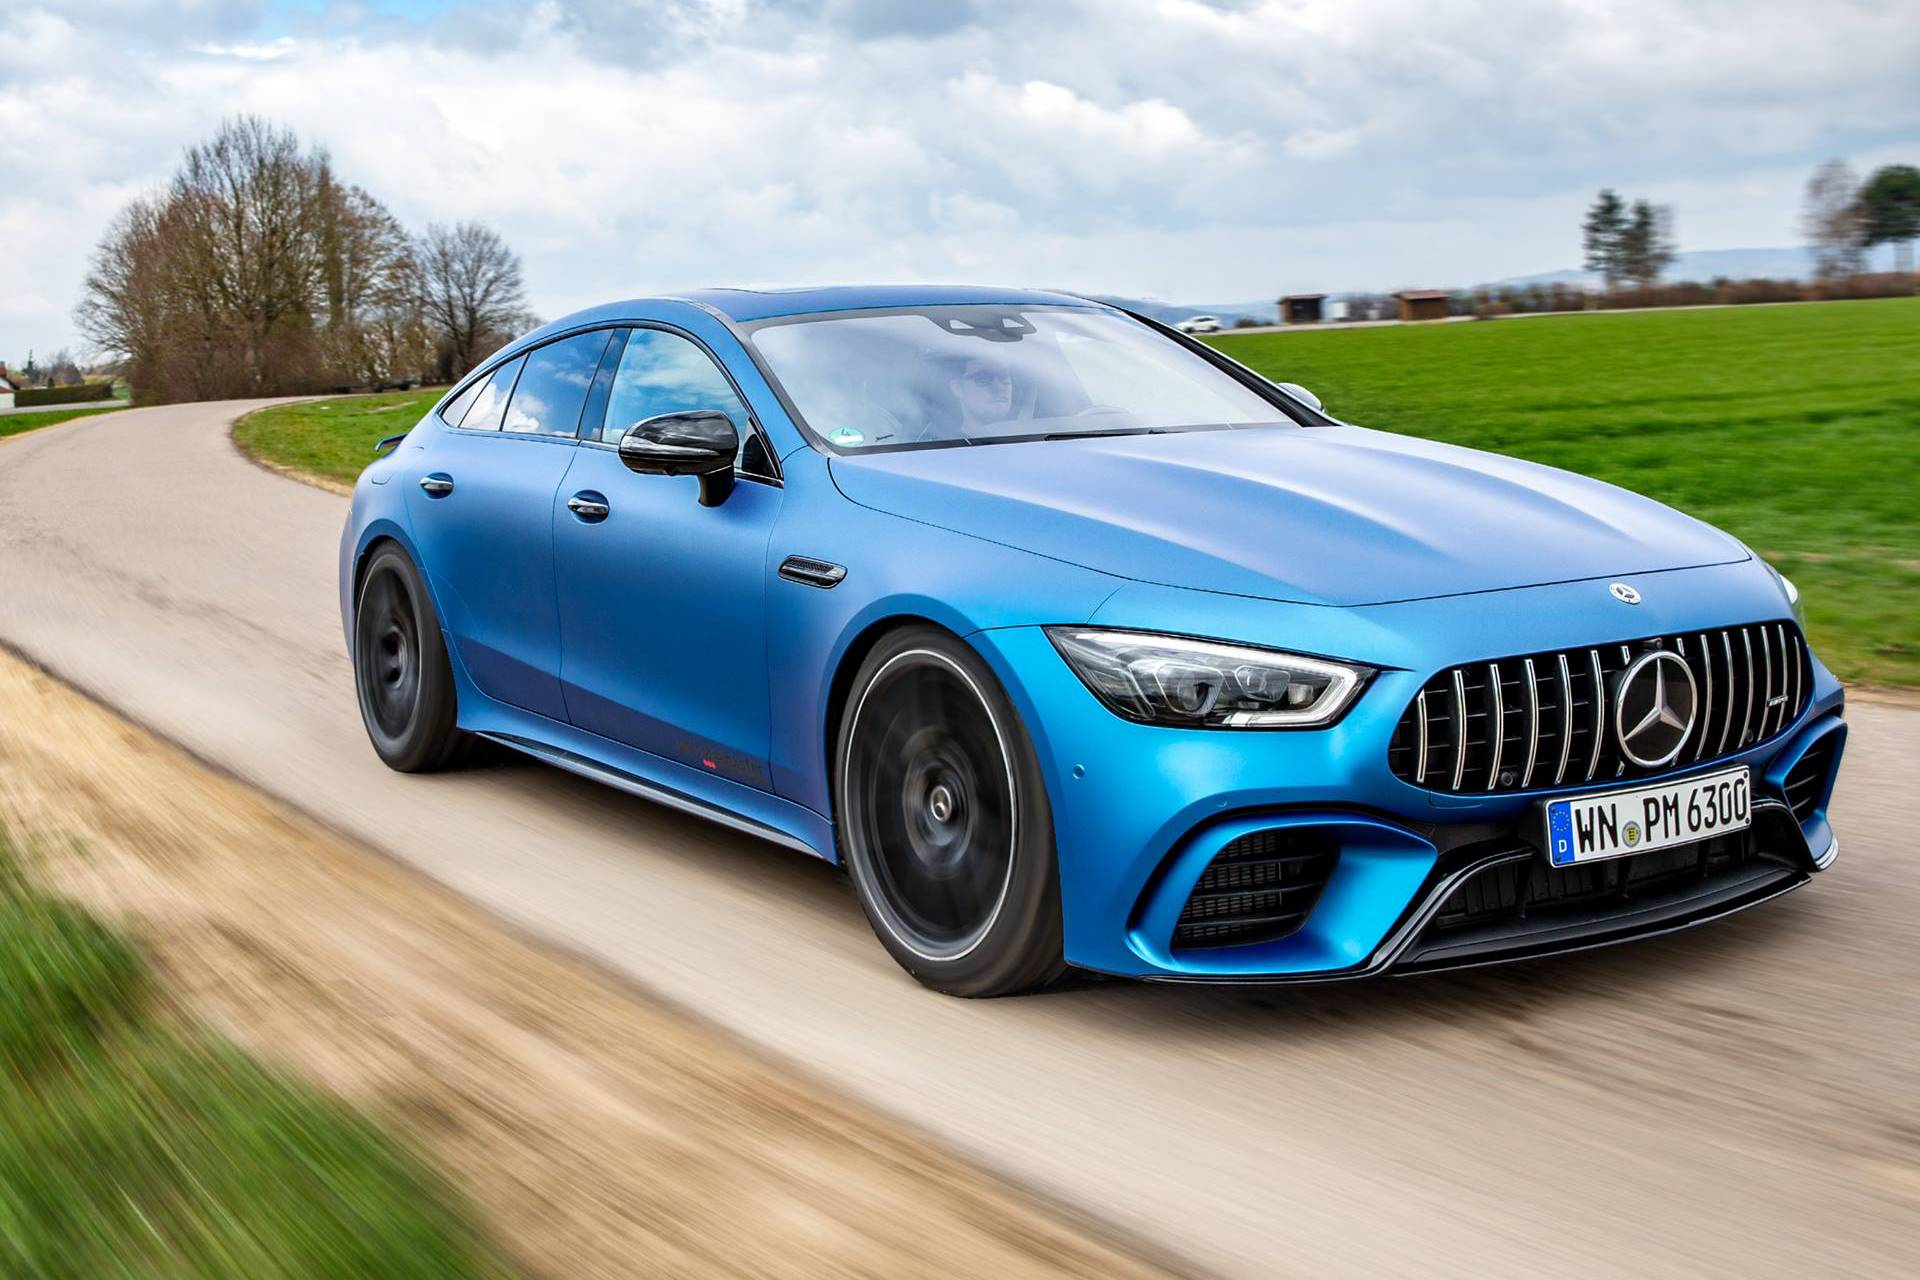 Mercedes-AMG-ov kupe u ubrzanju poput hiperautomobila (VIDEO)